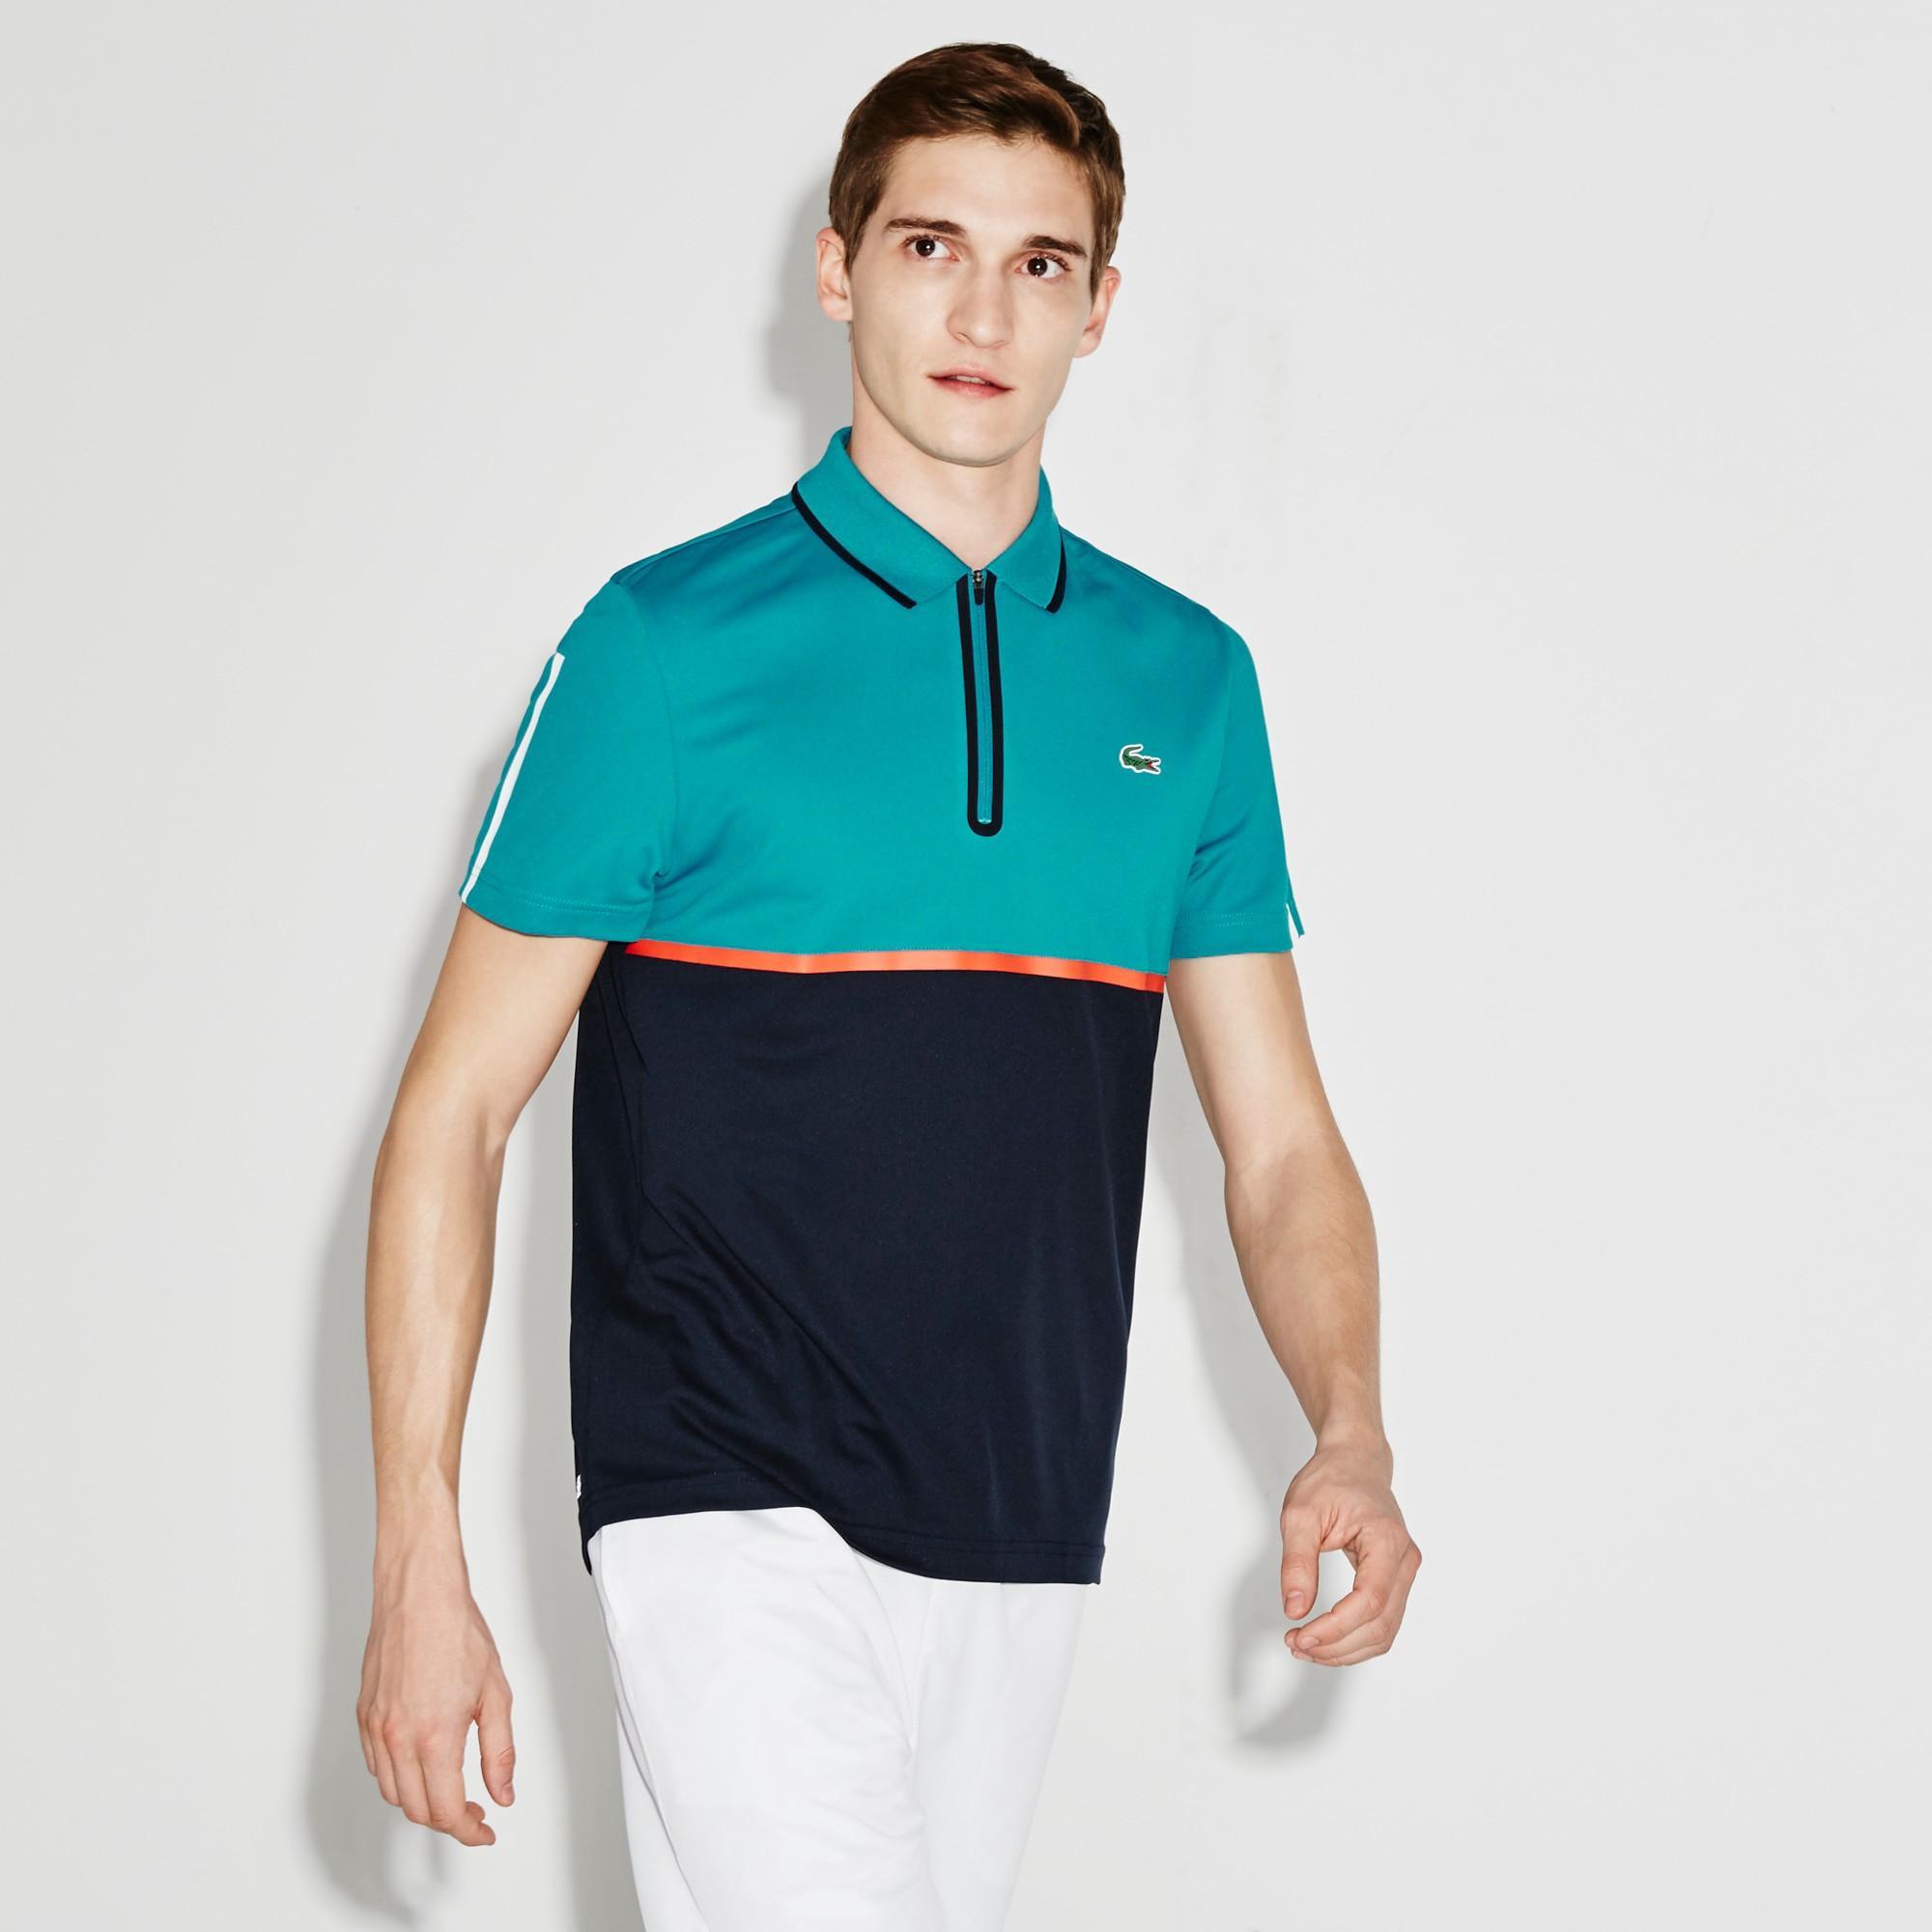 78fa6460 Lacoste Men's Sport Ultra Dry Zip Pique Knit Tennis Polo Shirt -  Oceanie/Navy Blue